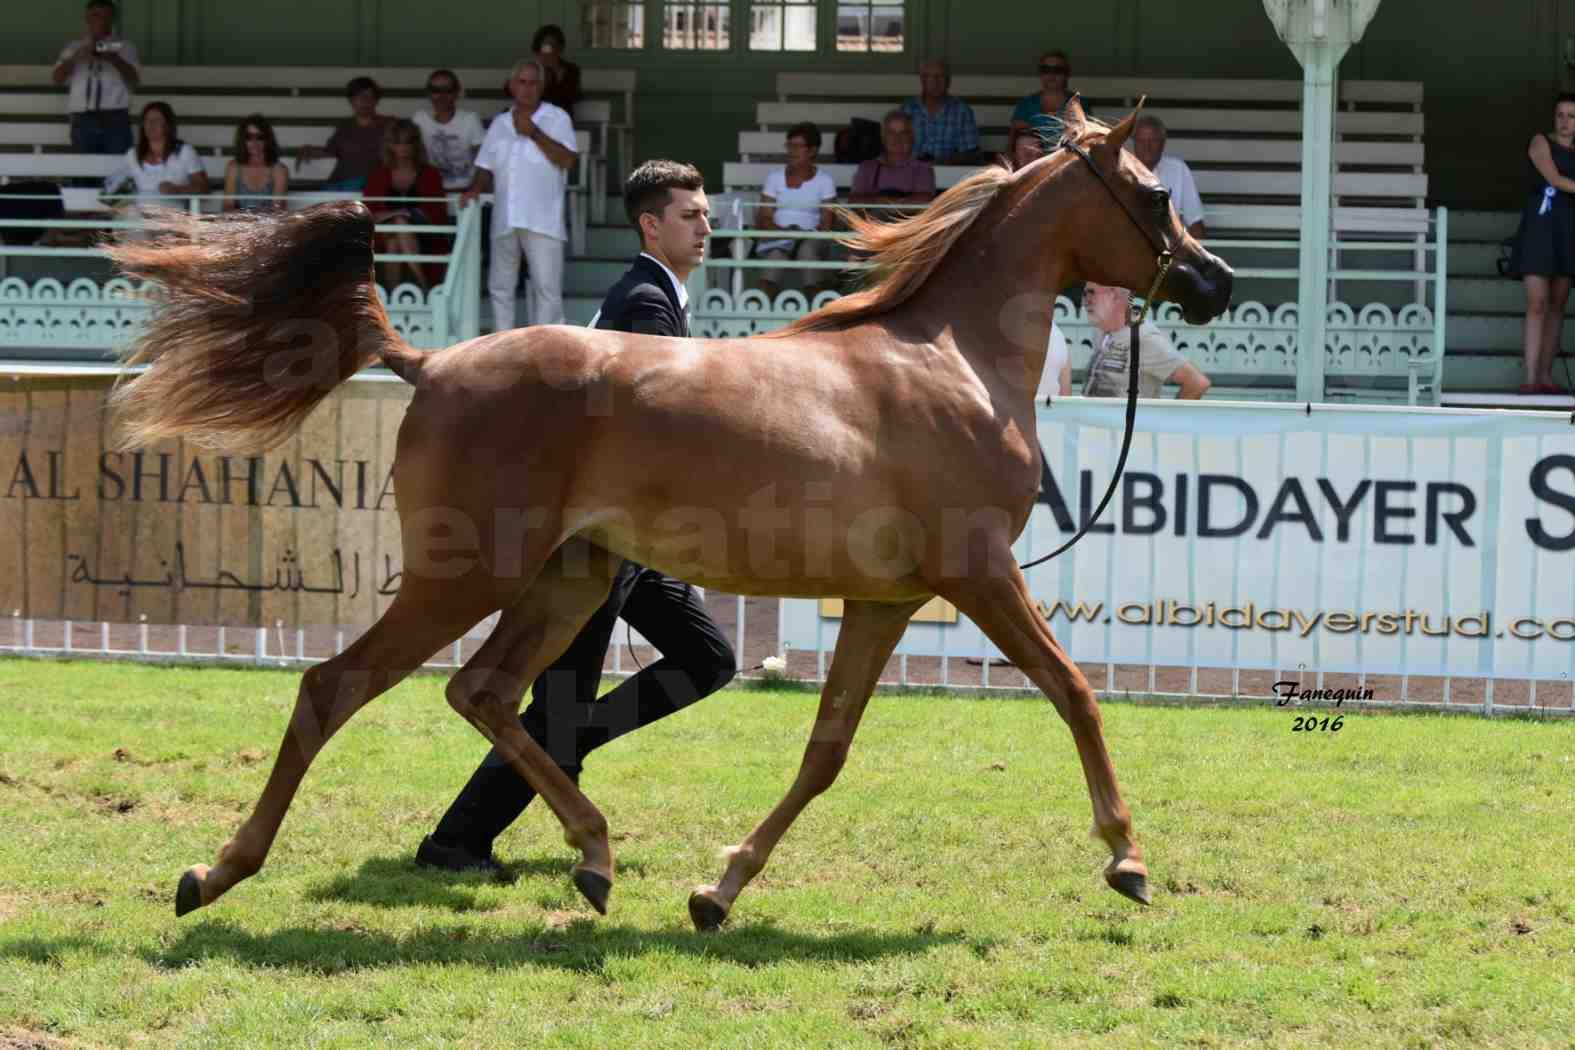 International Arabian Horse Show B de VICHY 2016 - JA FALAENE - Notre Sélection - 03